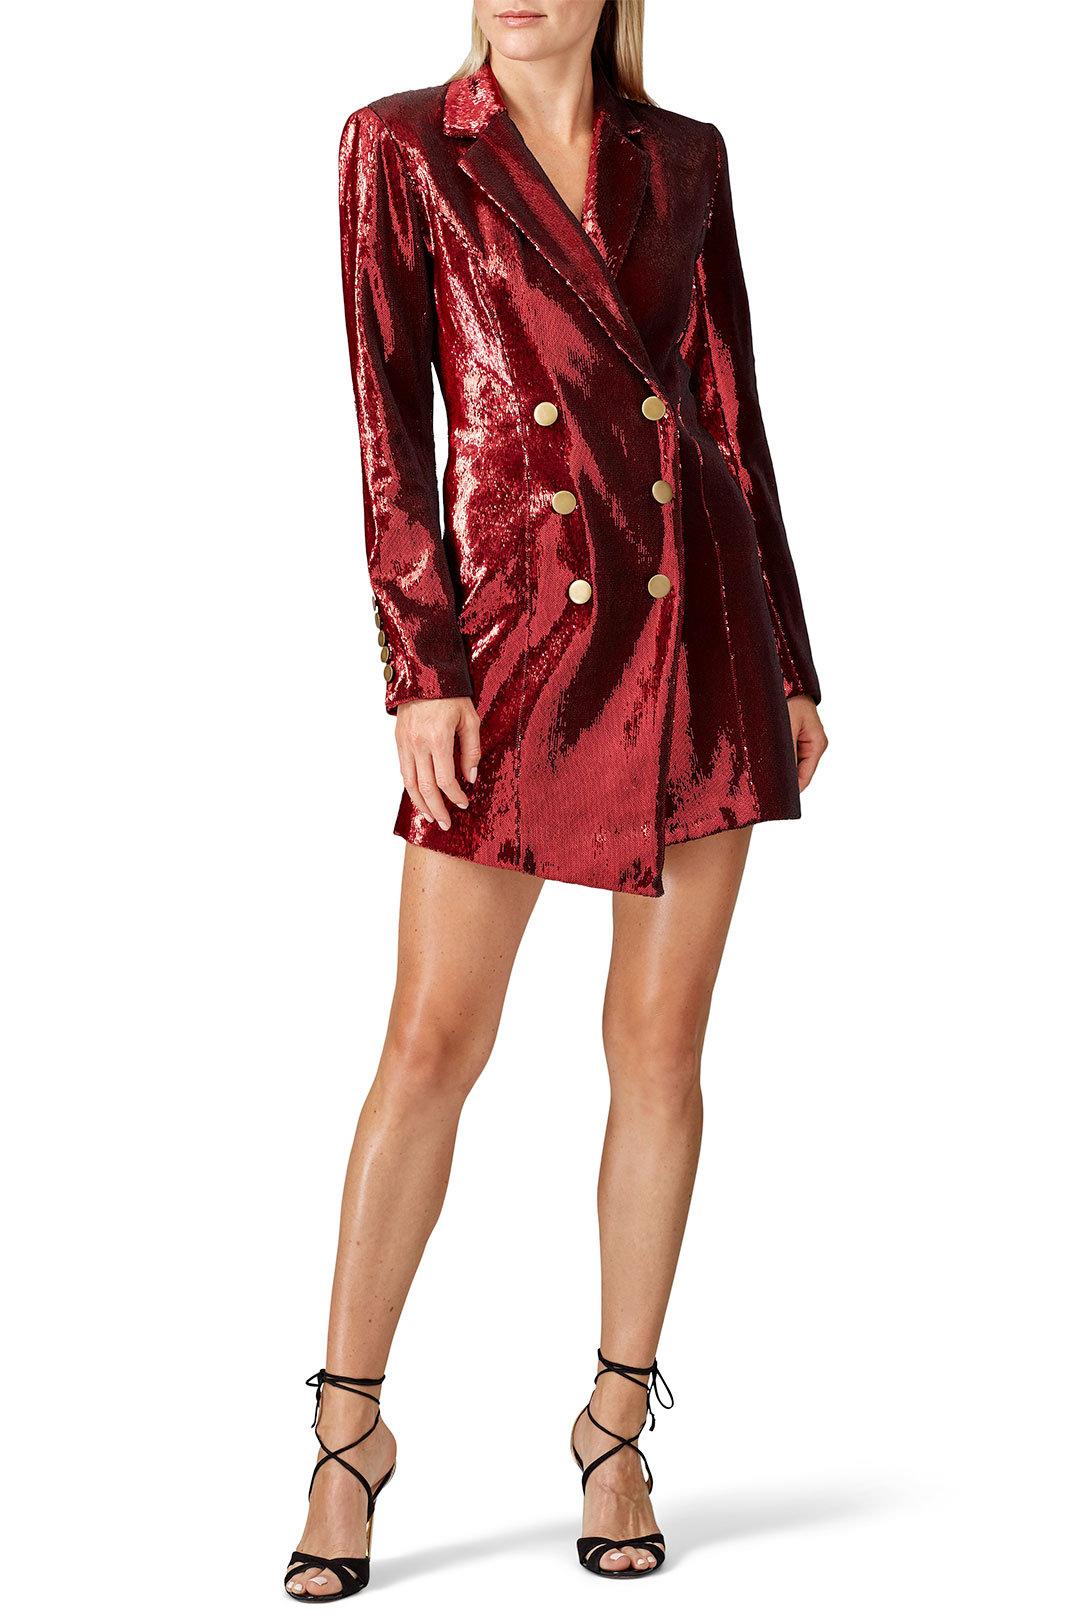 Retrofete - Selena Sequin Jacket Dress